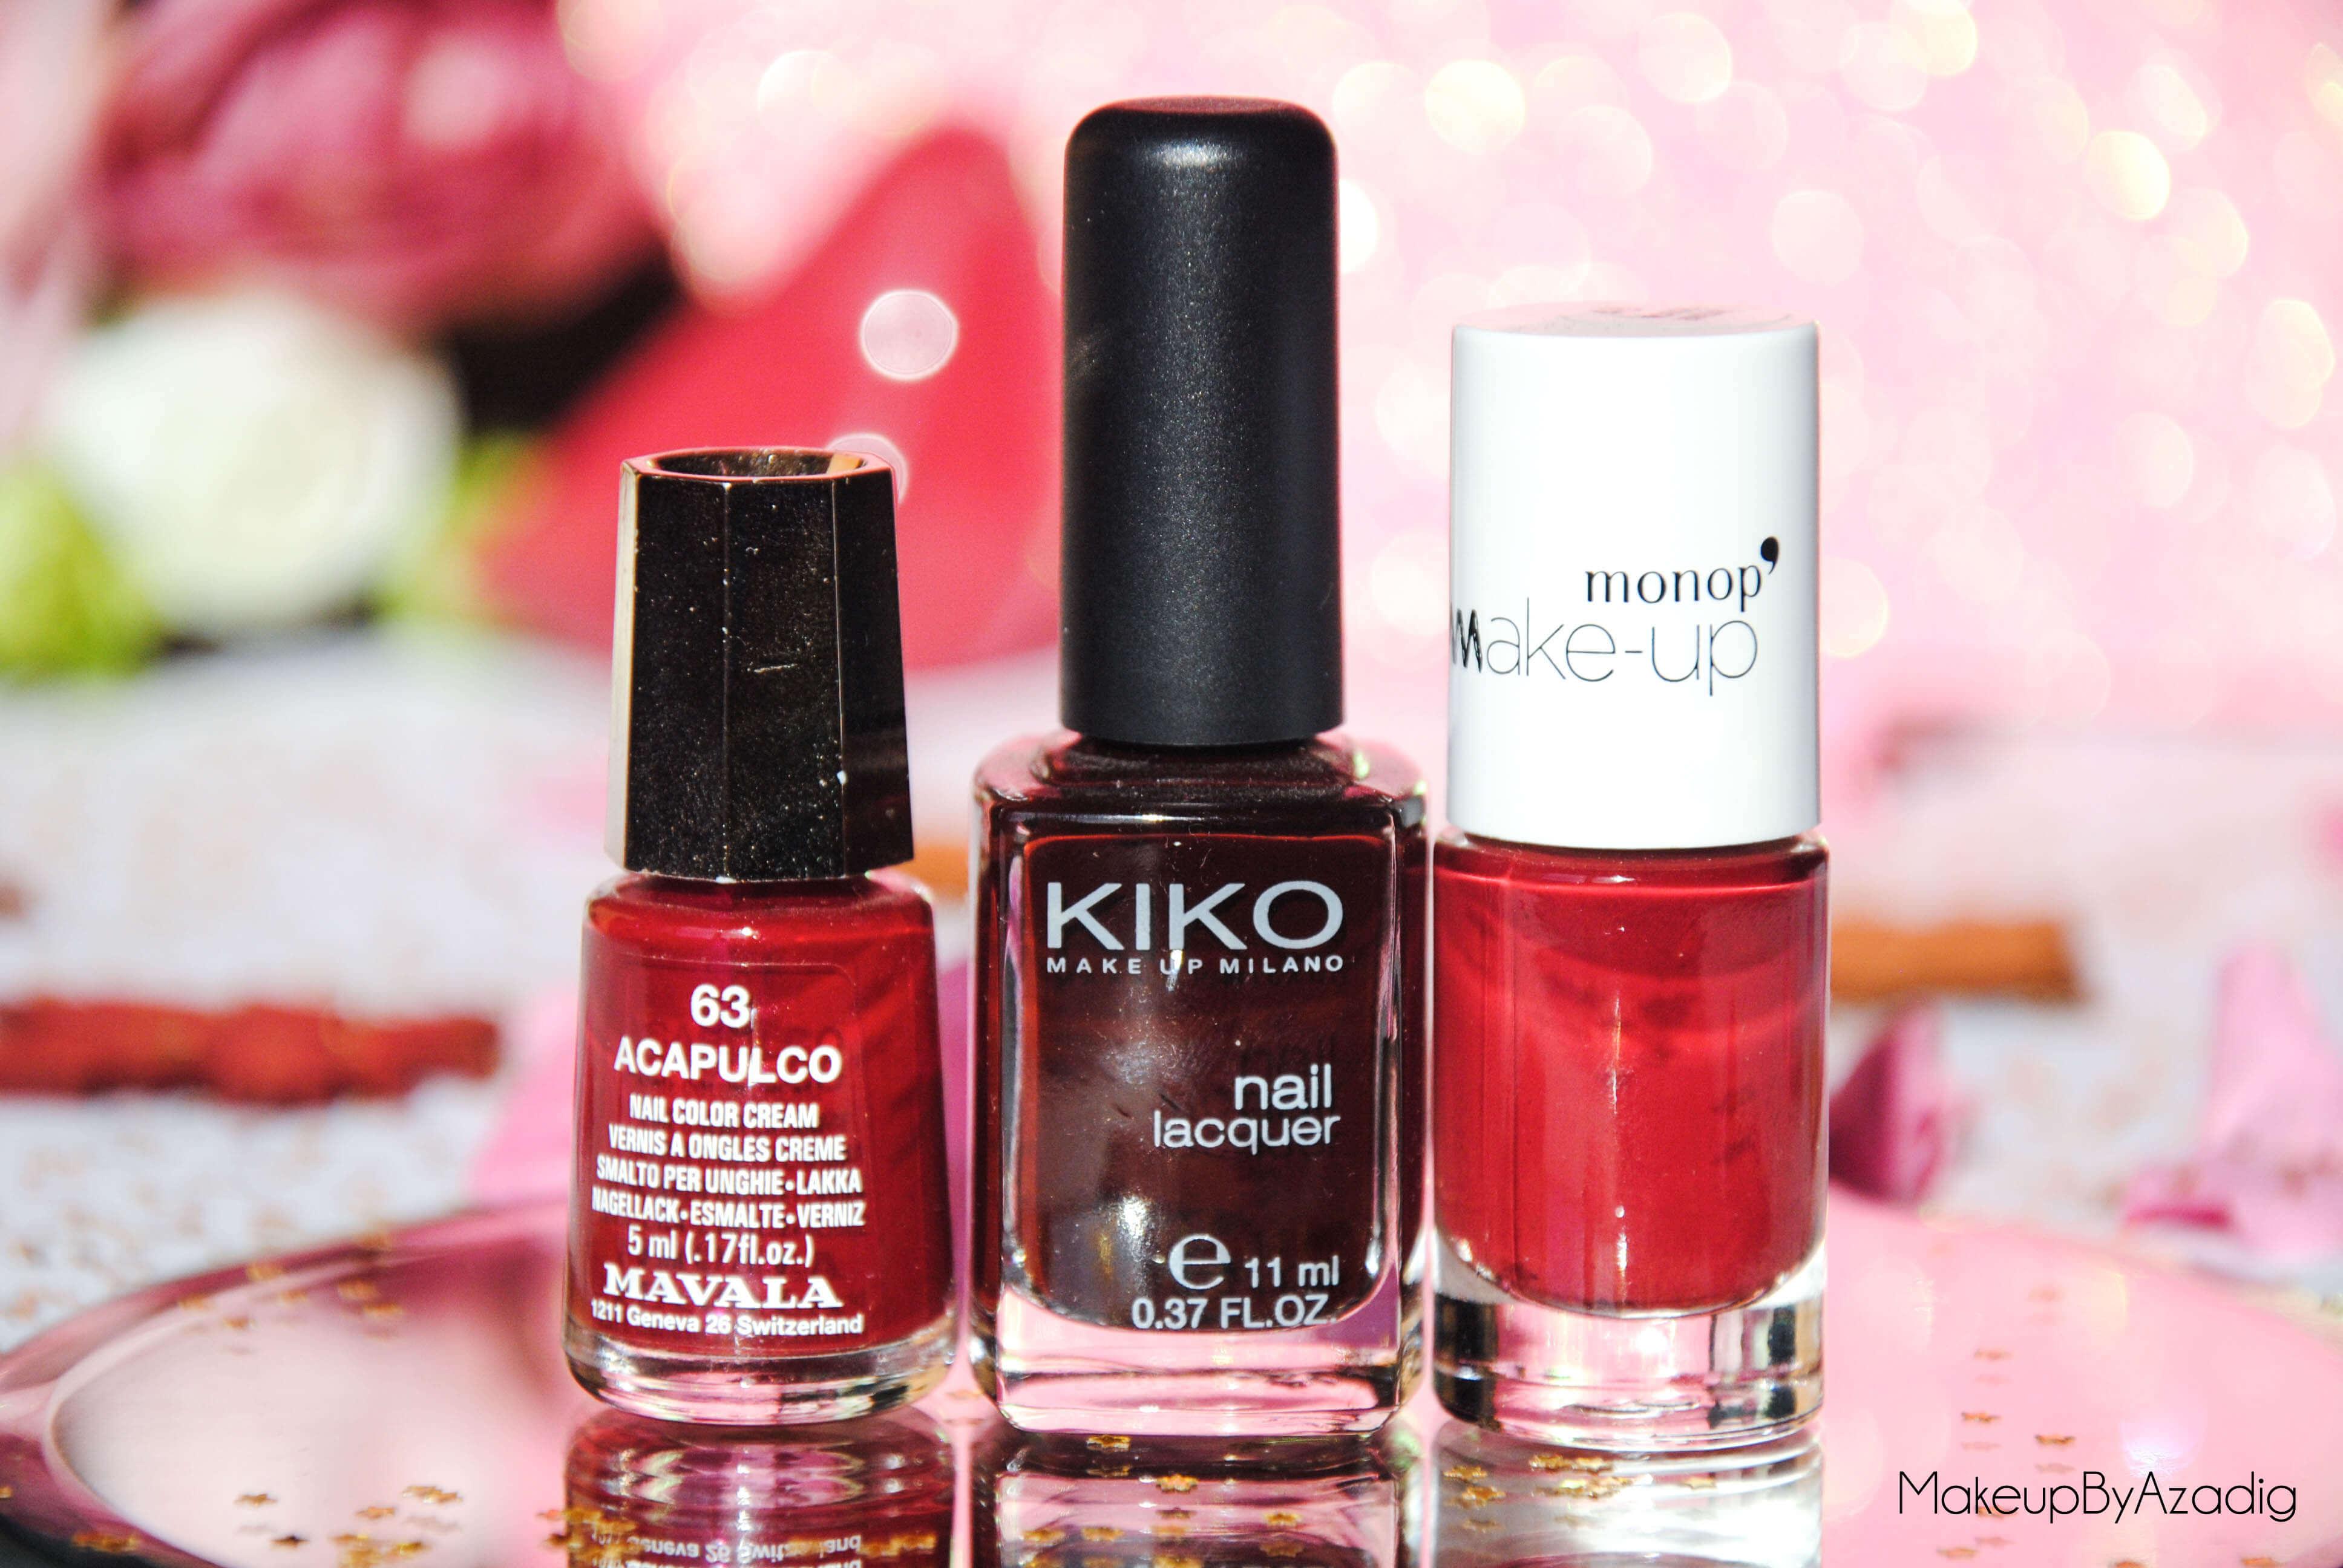 makeupbyazadig-vernis-tendance-automne-nails-autumn-formula-x-monop-makeup-troyes-dijon-paris-sandrea26france-camaieu-opi-kiko-sephora-mavala-essie-red